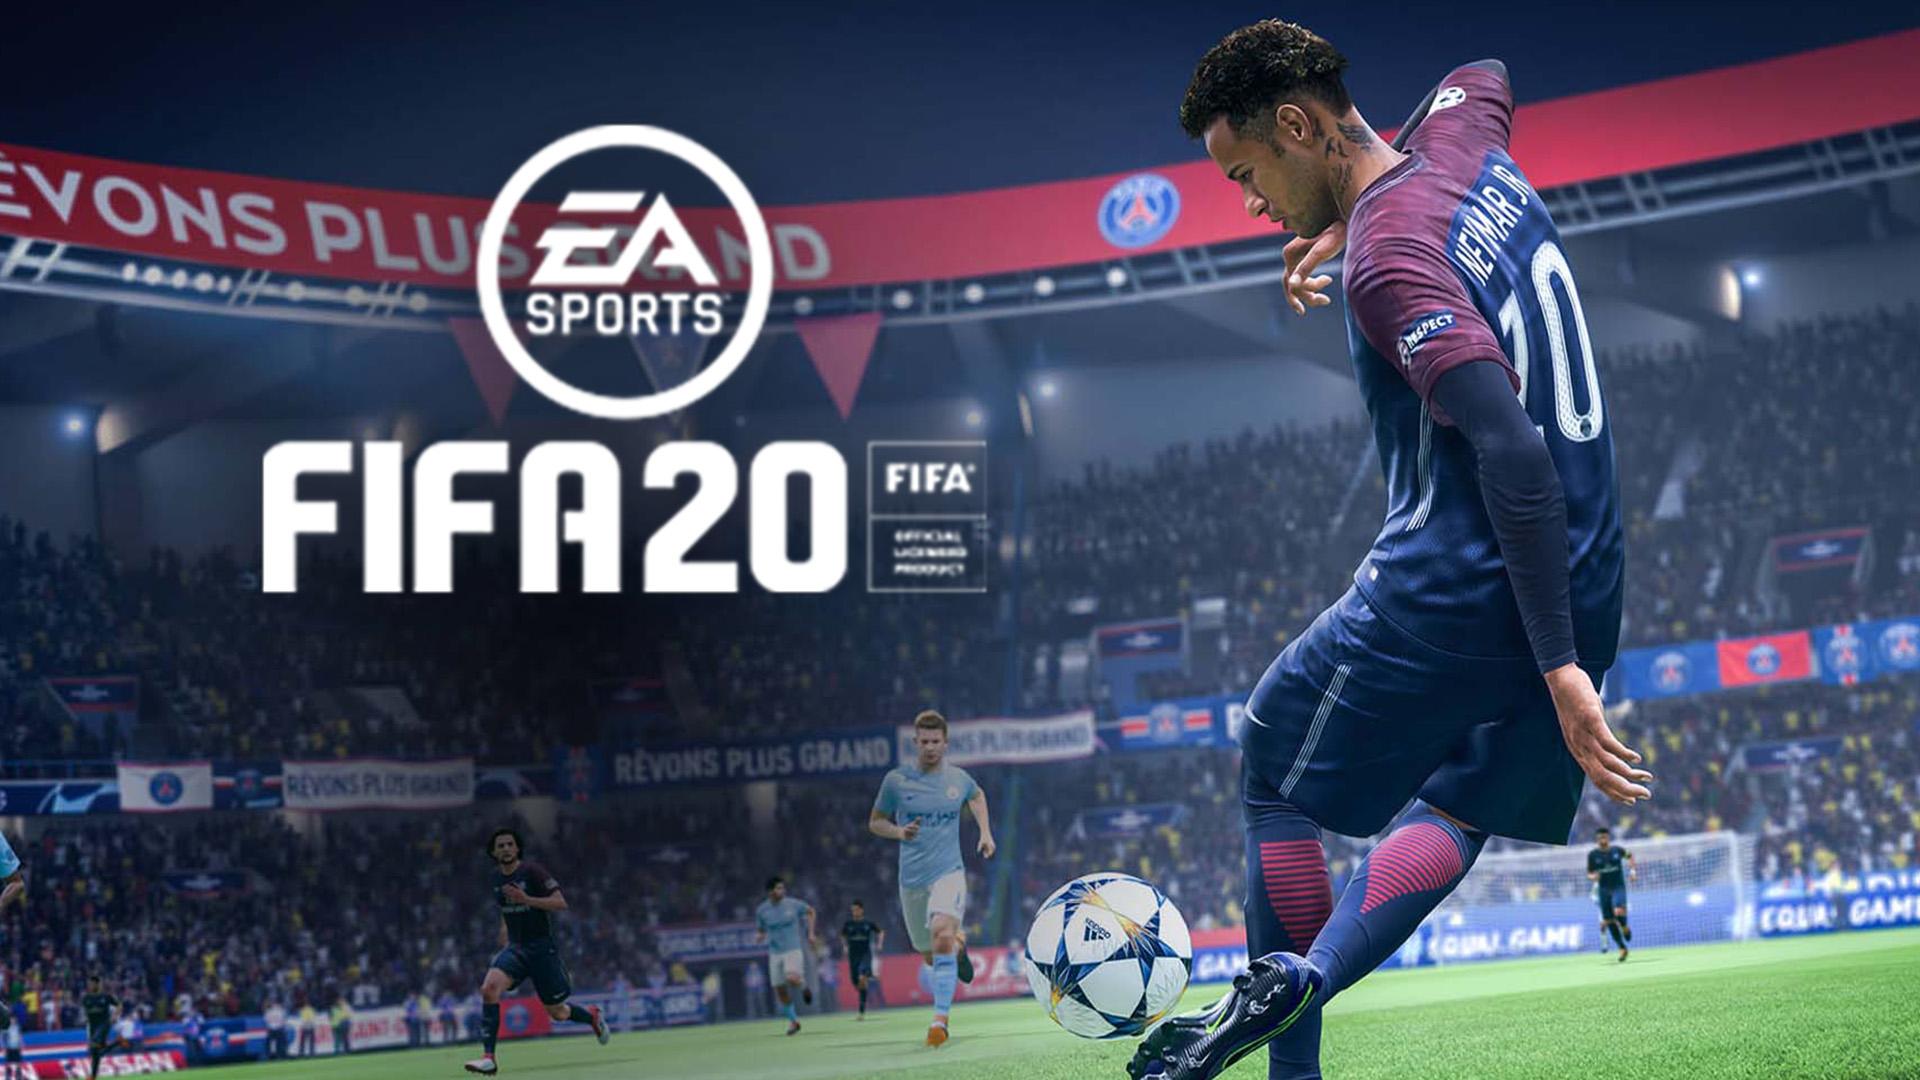 FIFA 20 Neymar dribles